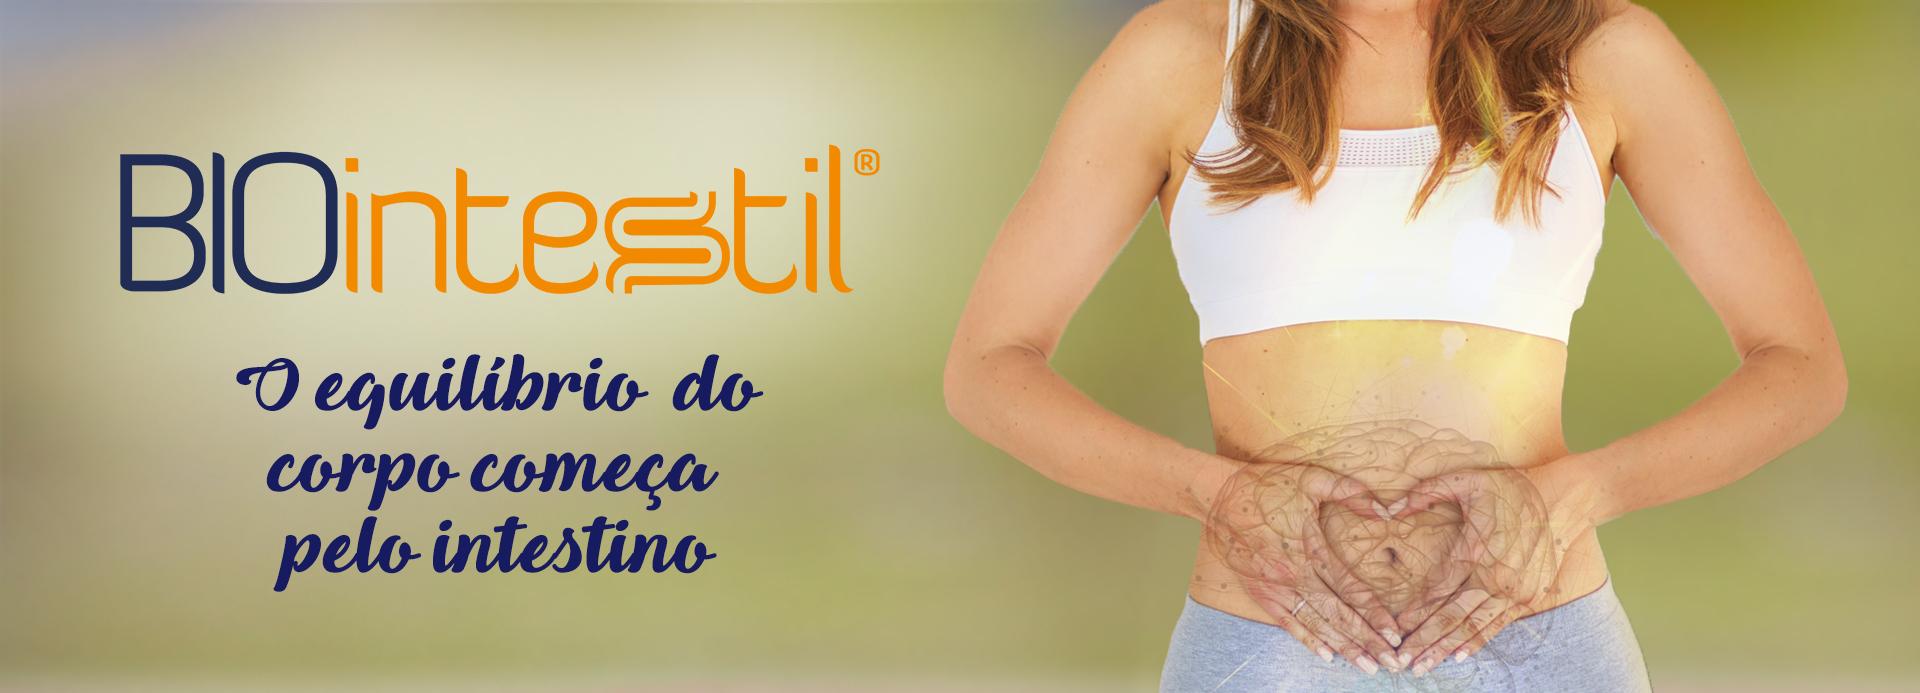 BIOintestil 600mg 30 cápsulas - Saúde gastrointestinal - FarmáciaSaúde ❤    Farmácia de Manipulação